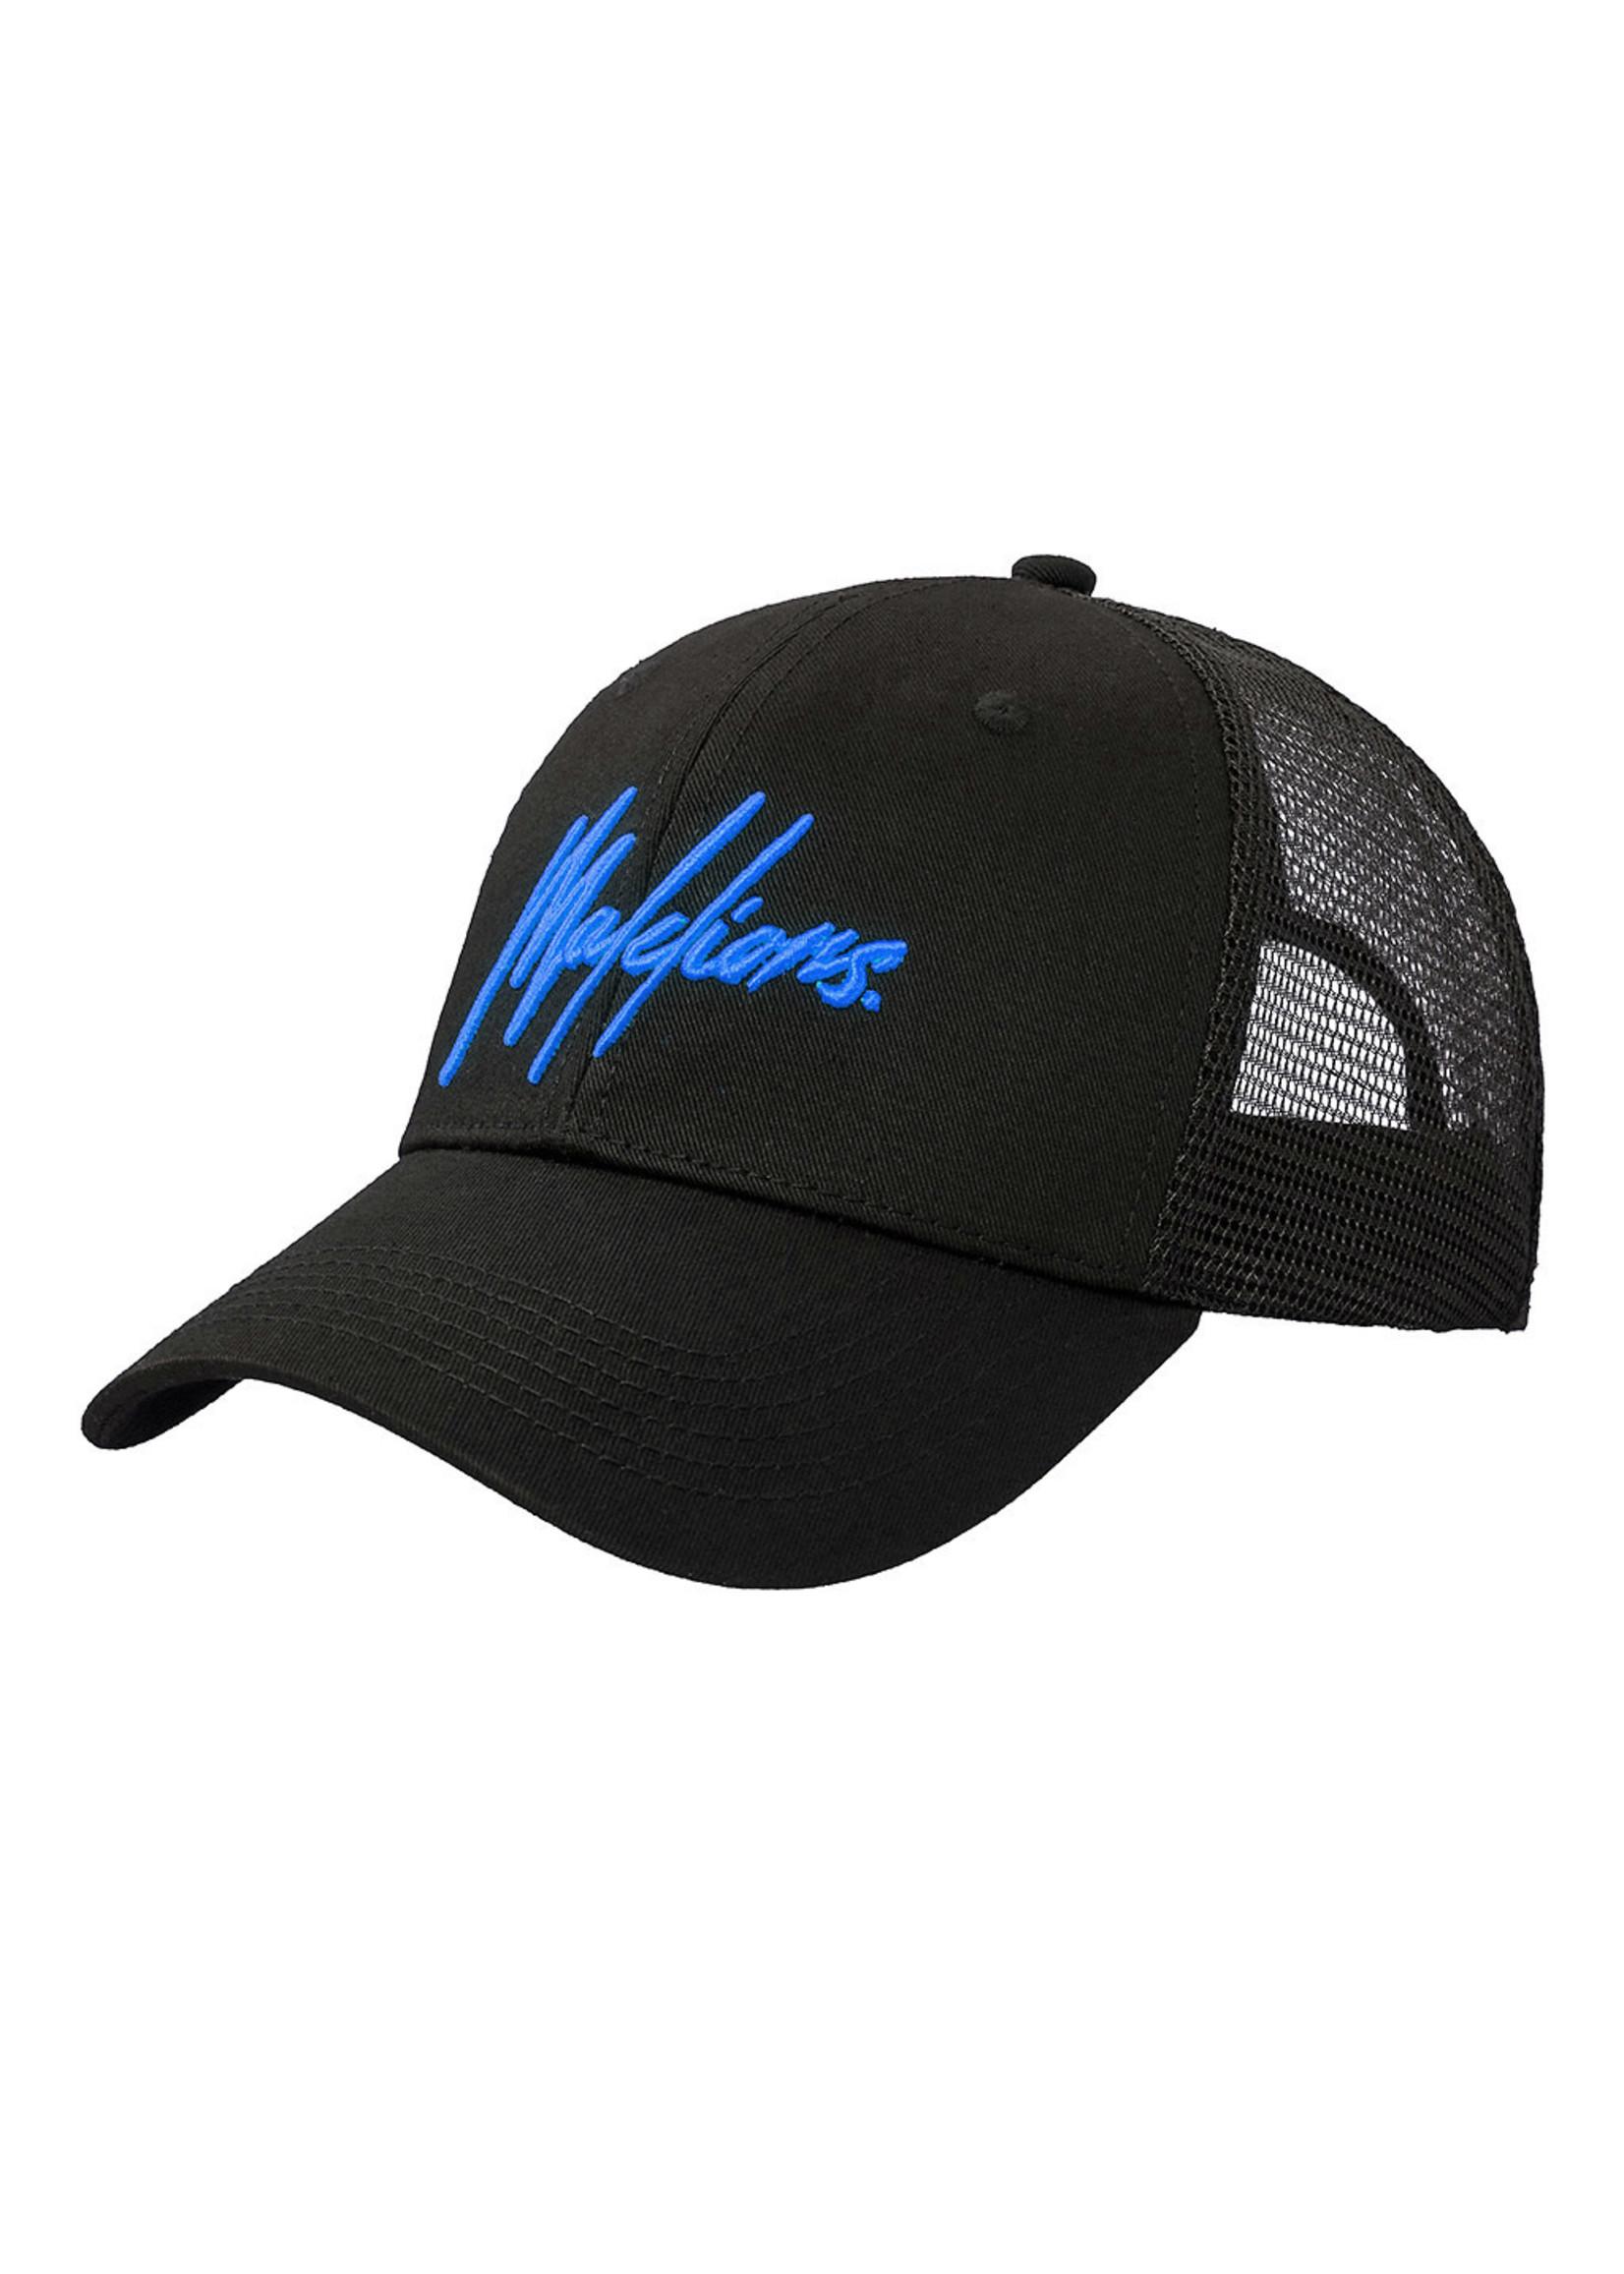 Malelions Malelions Signature Cap - Black/Blue